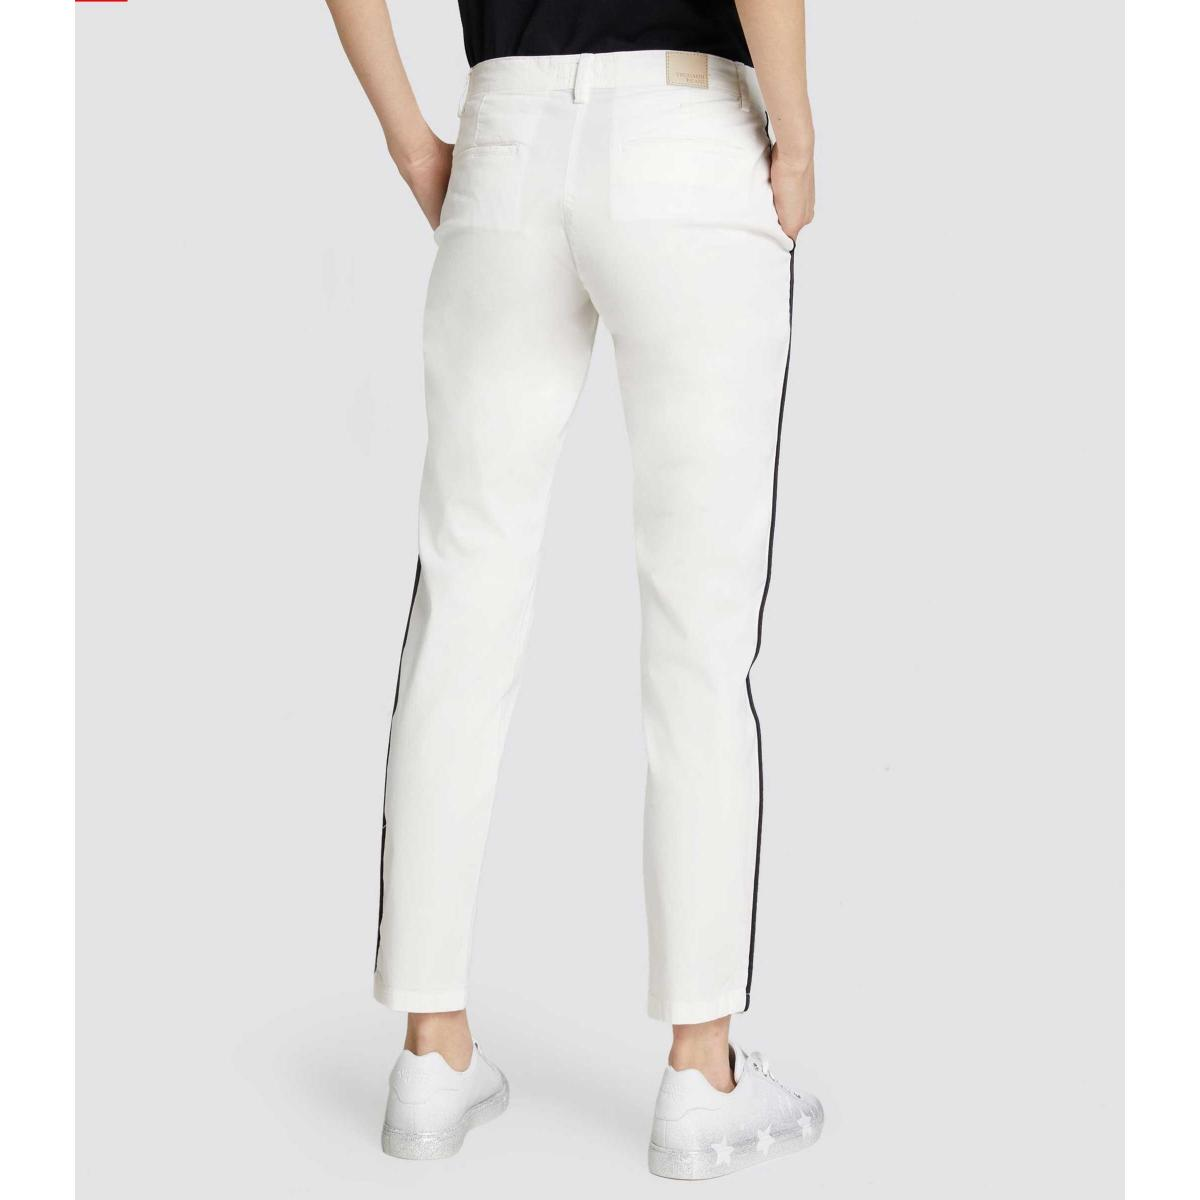 Pantaloni Trussardi 260 chinos con banda da donna rif. 56P00001 1T002325